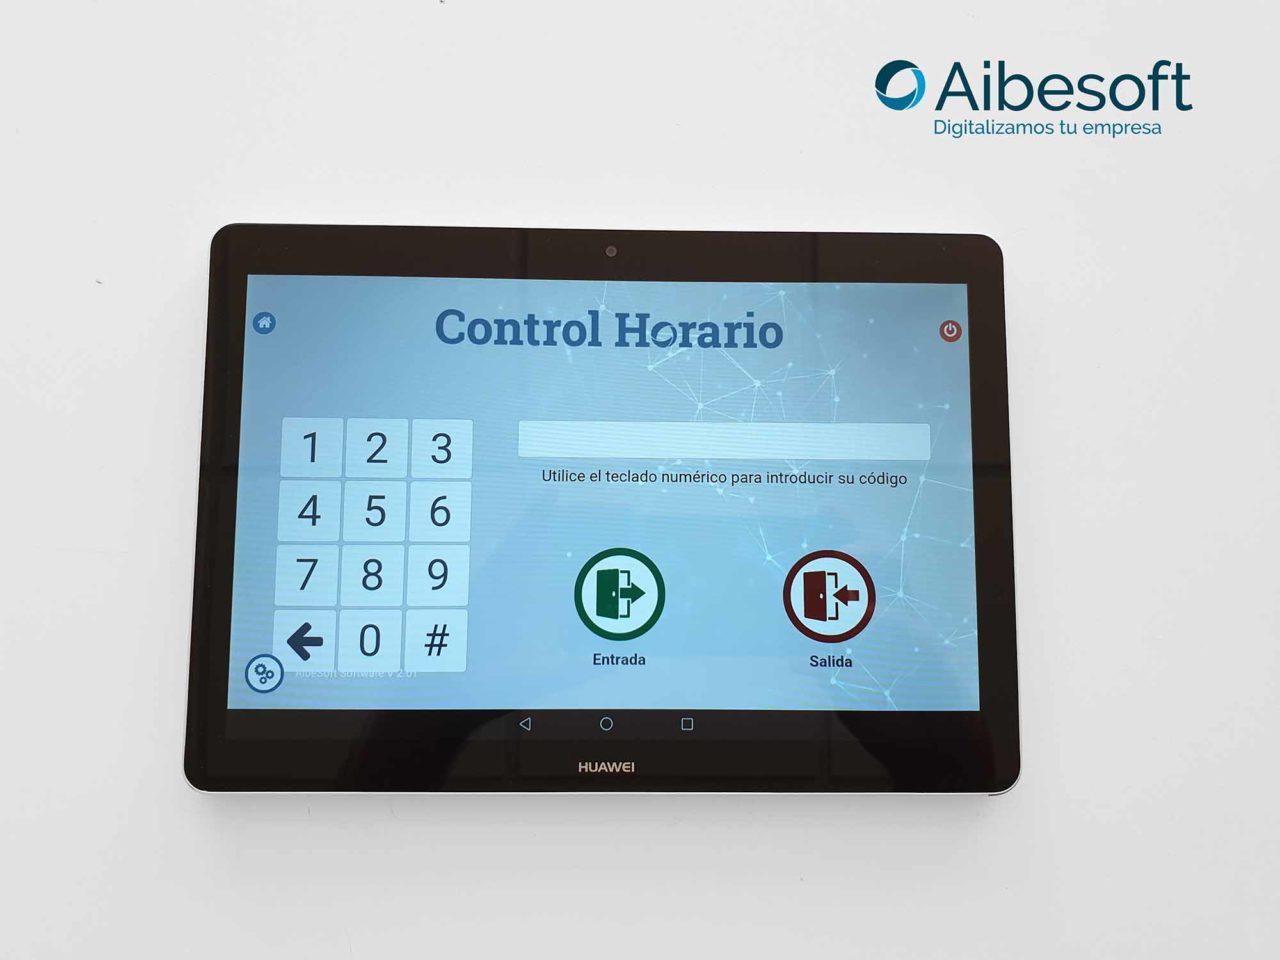 https://www.aibesoft.es/wp-content/uploads/2019/04/CONTROL-HORARIO-1-1280x960.jpg